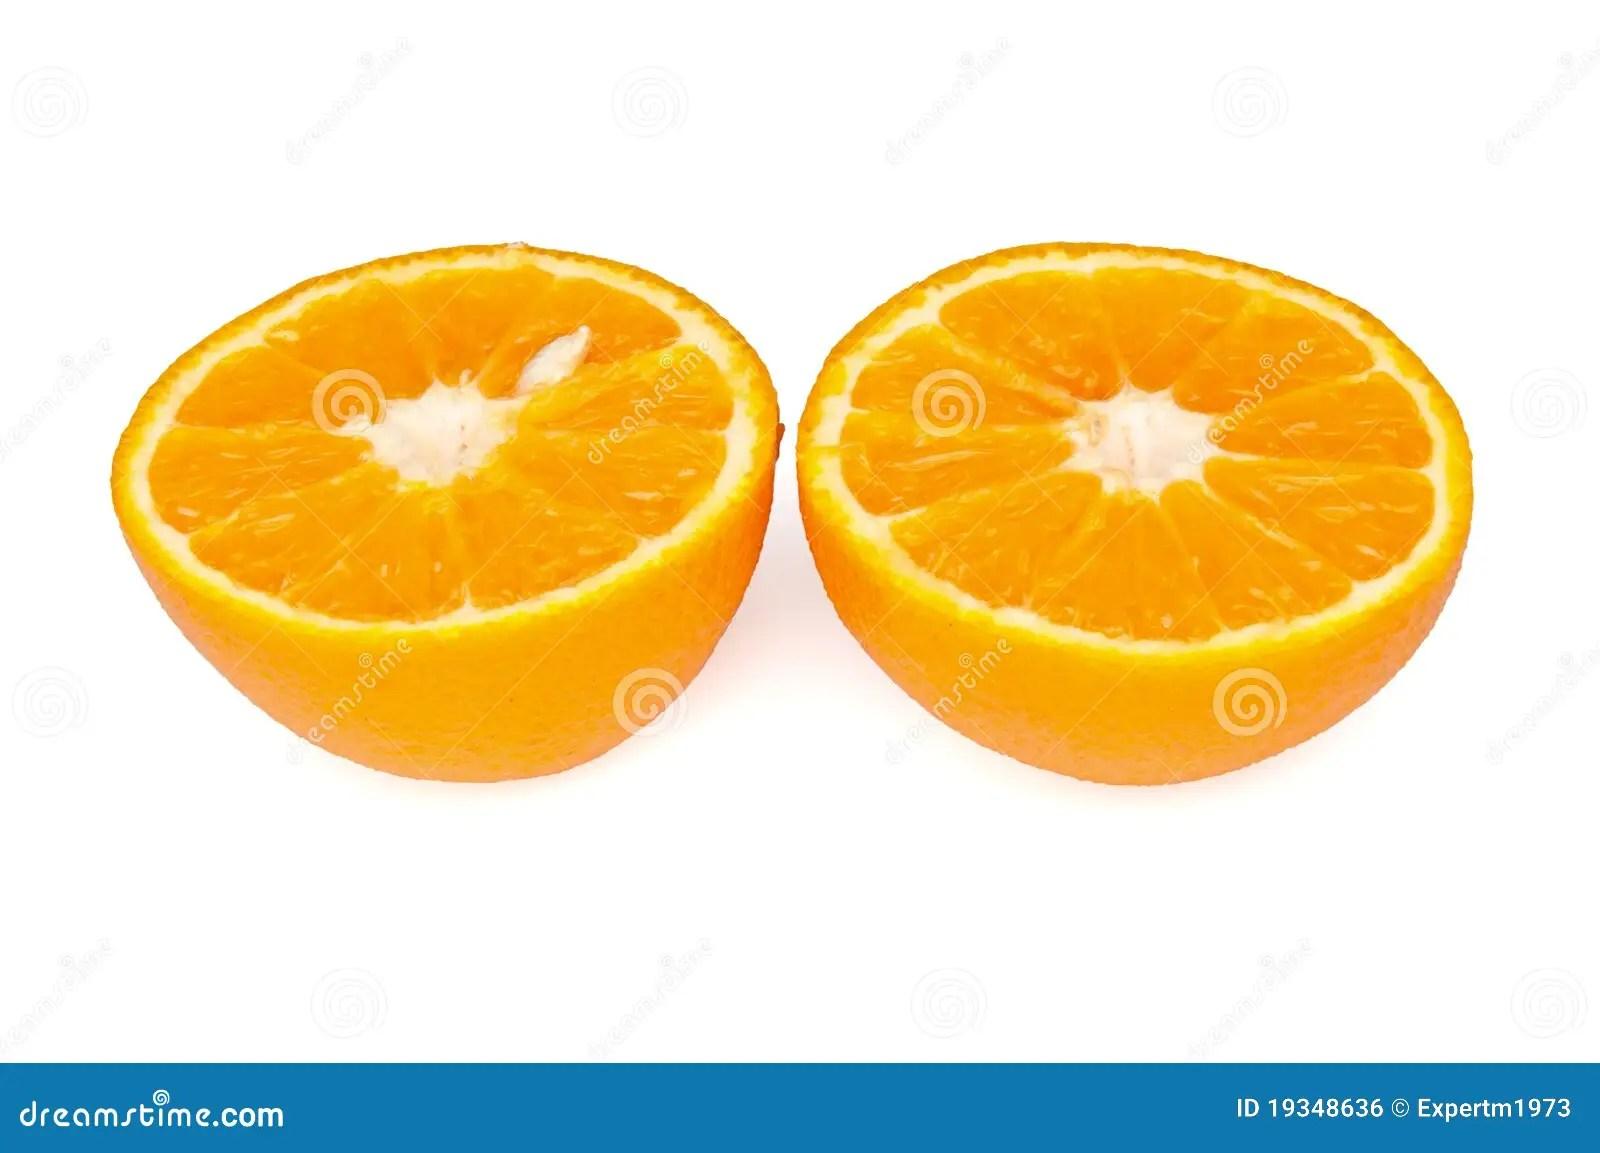 Cut In Half An Orange Royalty Free Stock Image Image